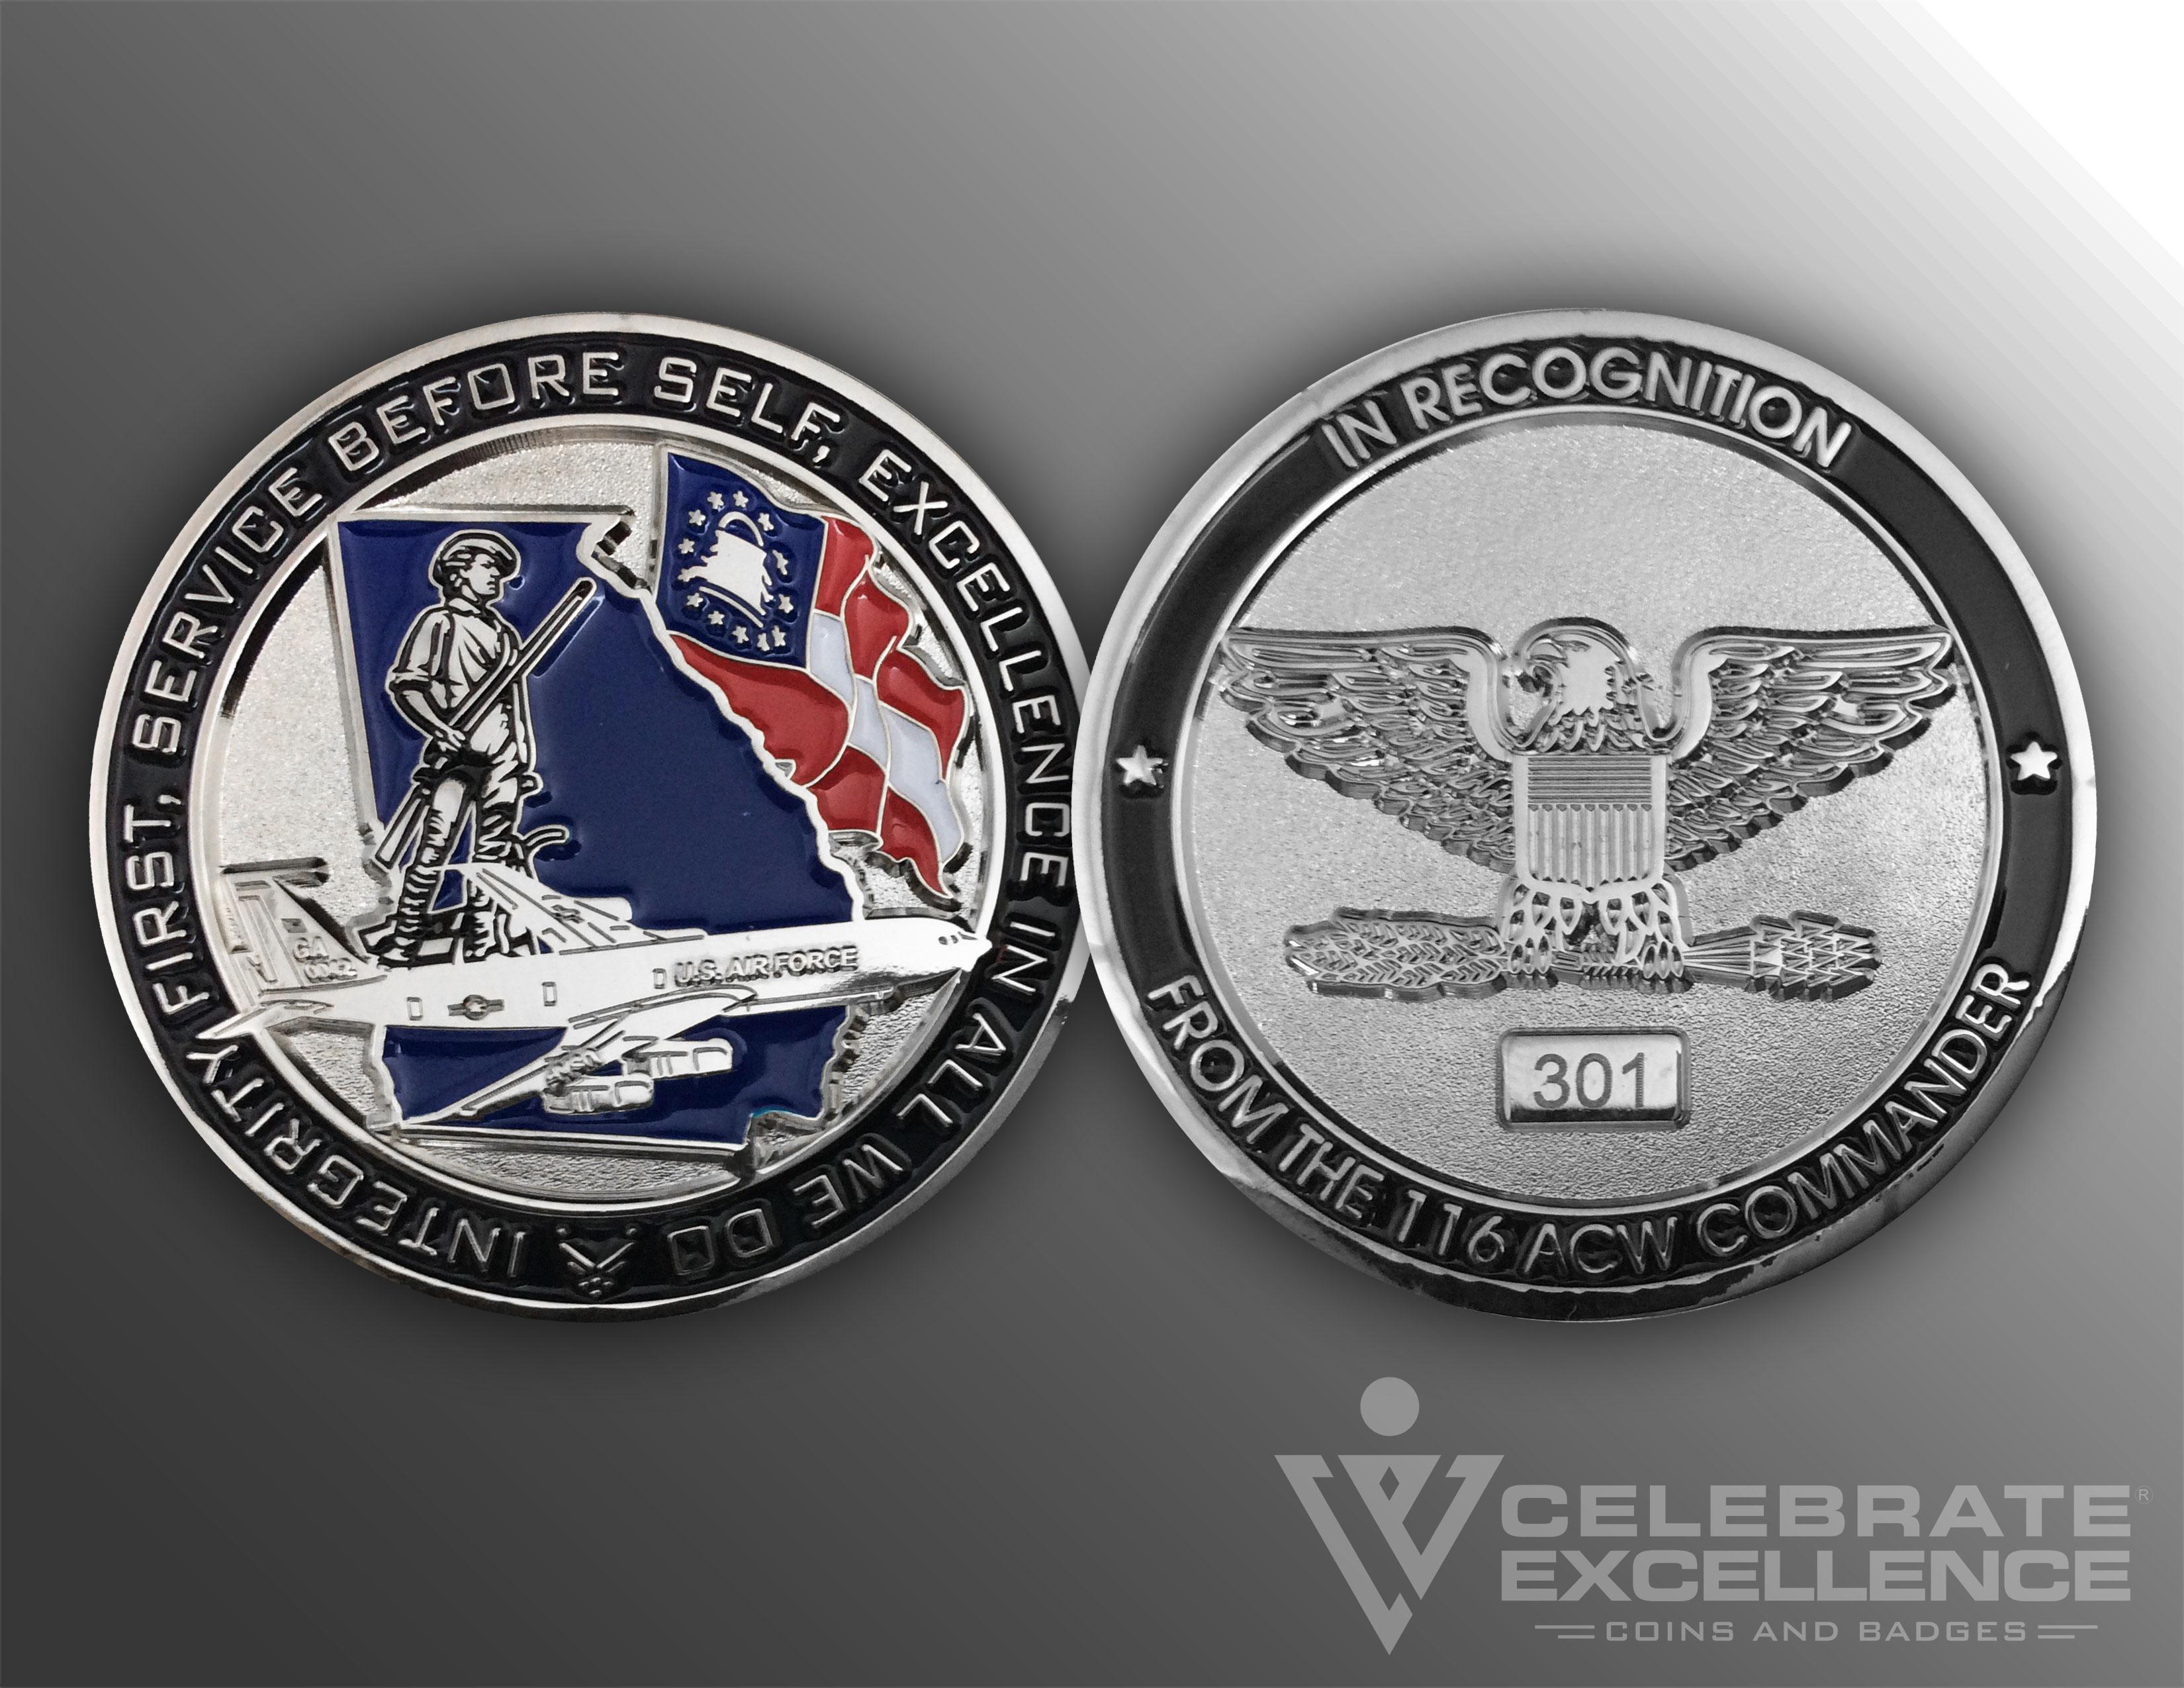 116-ACW-Commander-coin